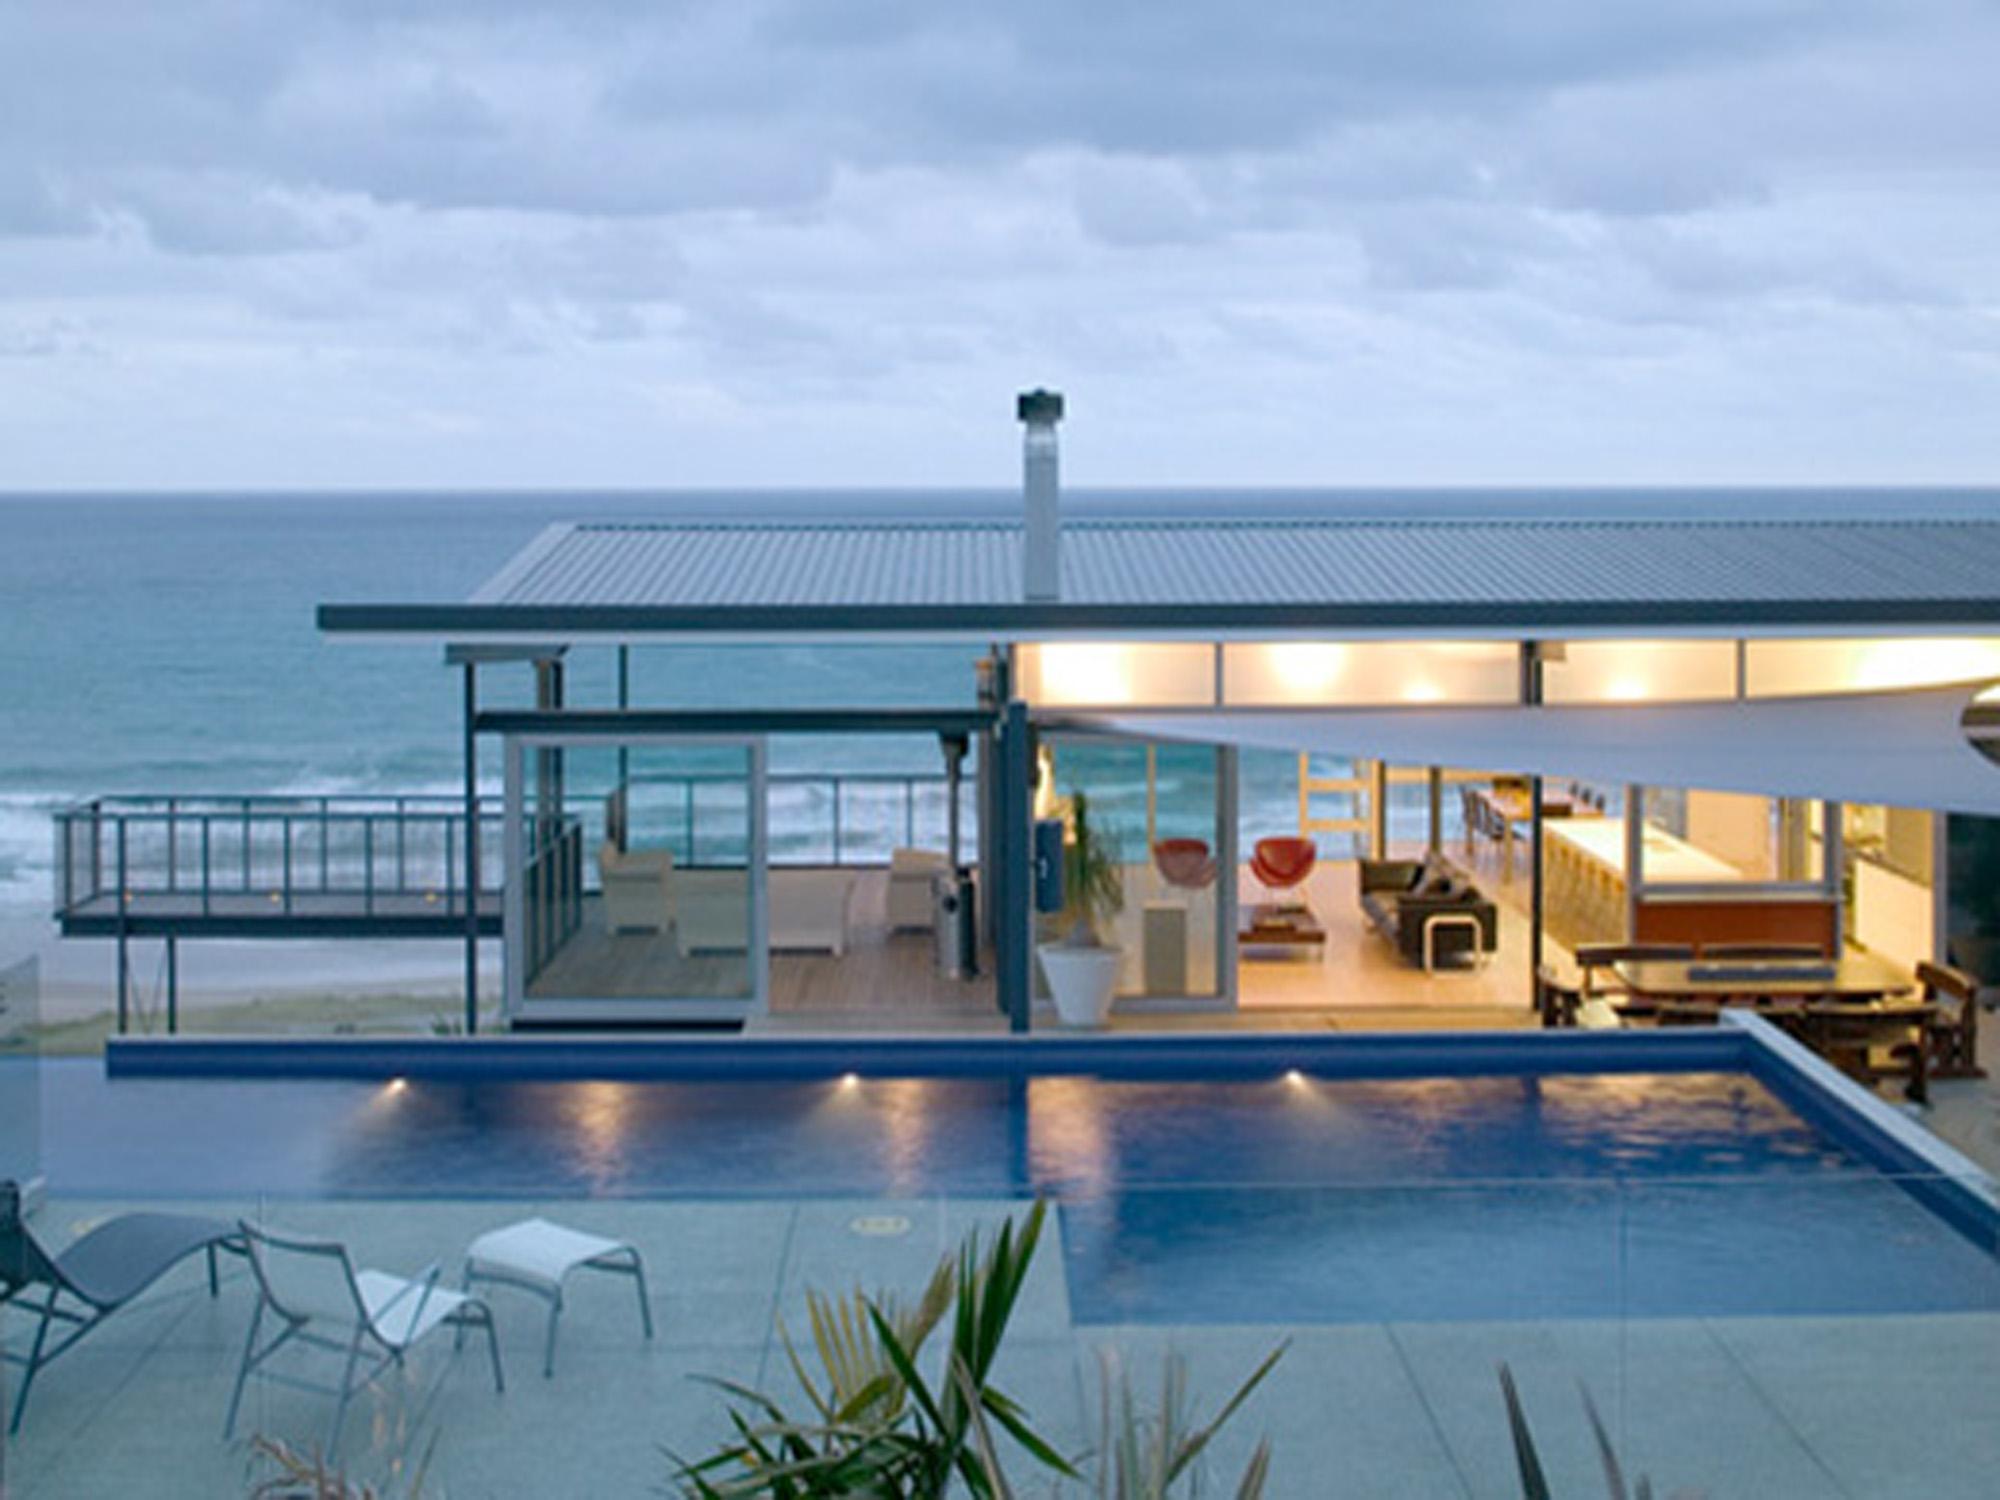 Coastal House Designscontemporary Beach House Plans Modern Beach